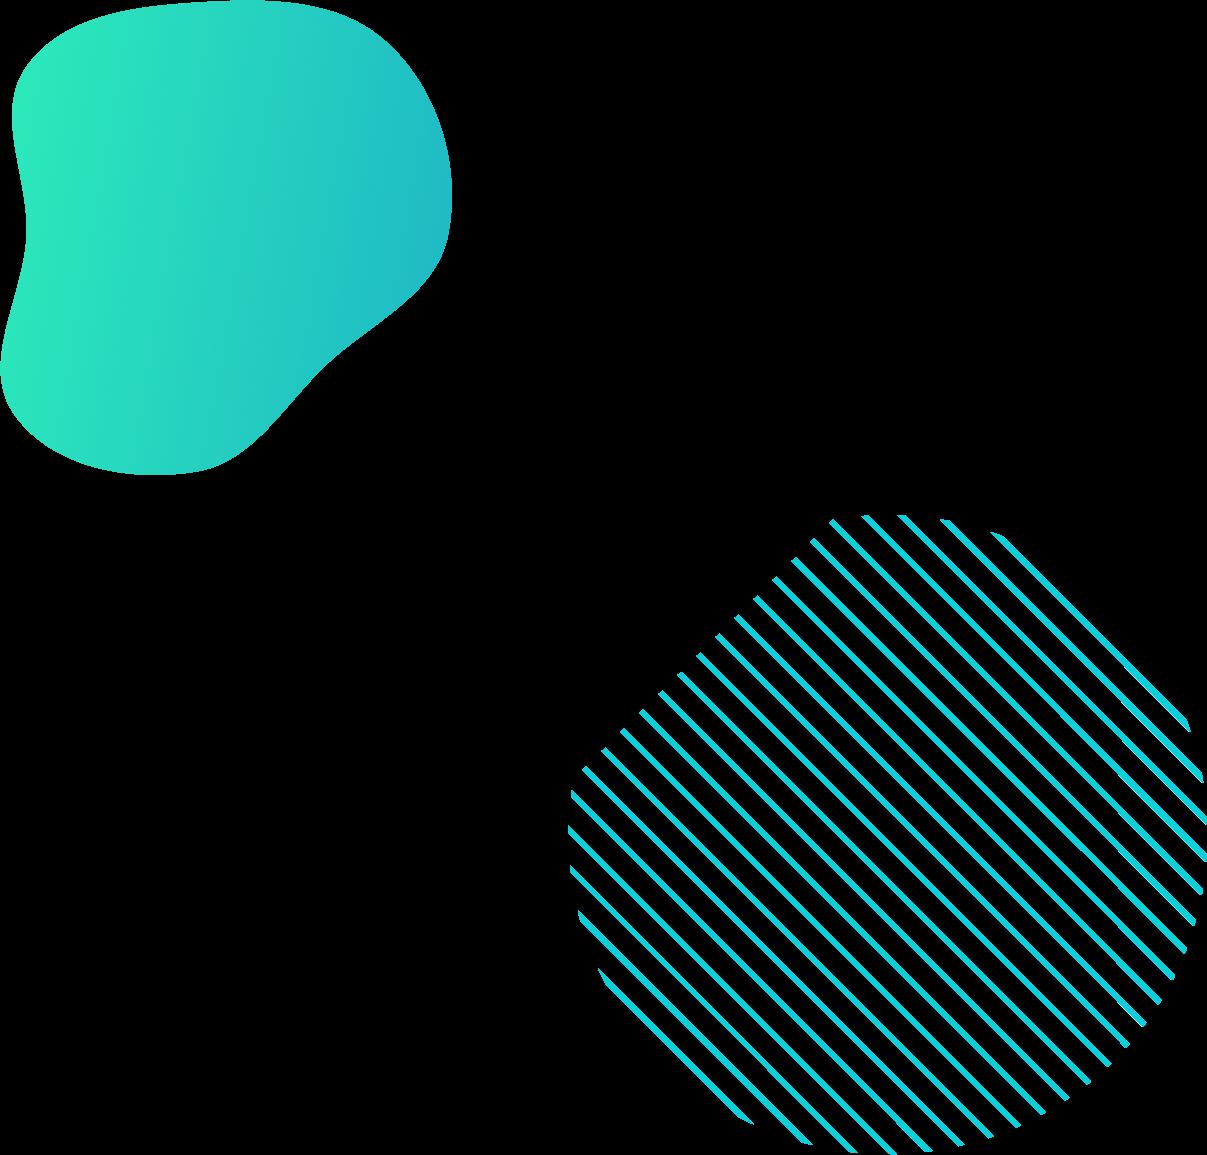 background design elements